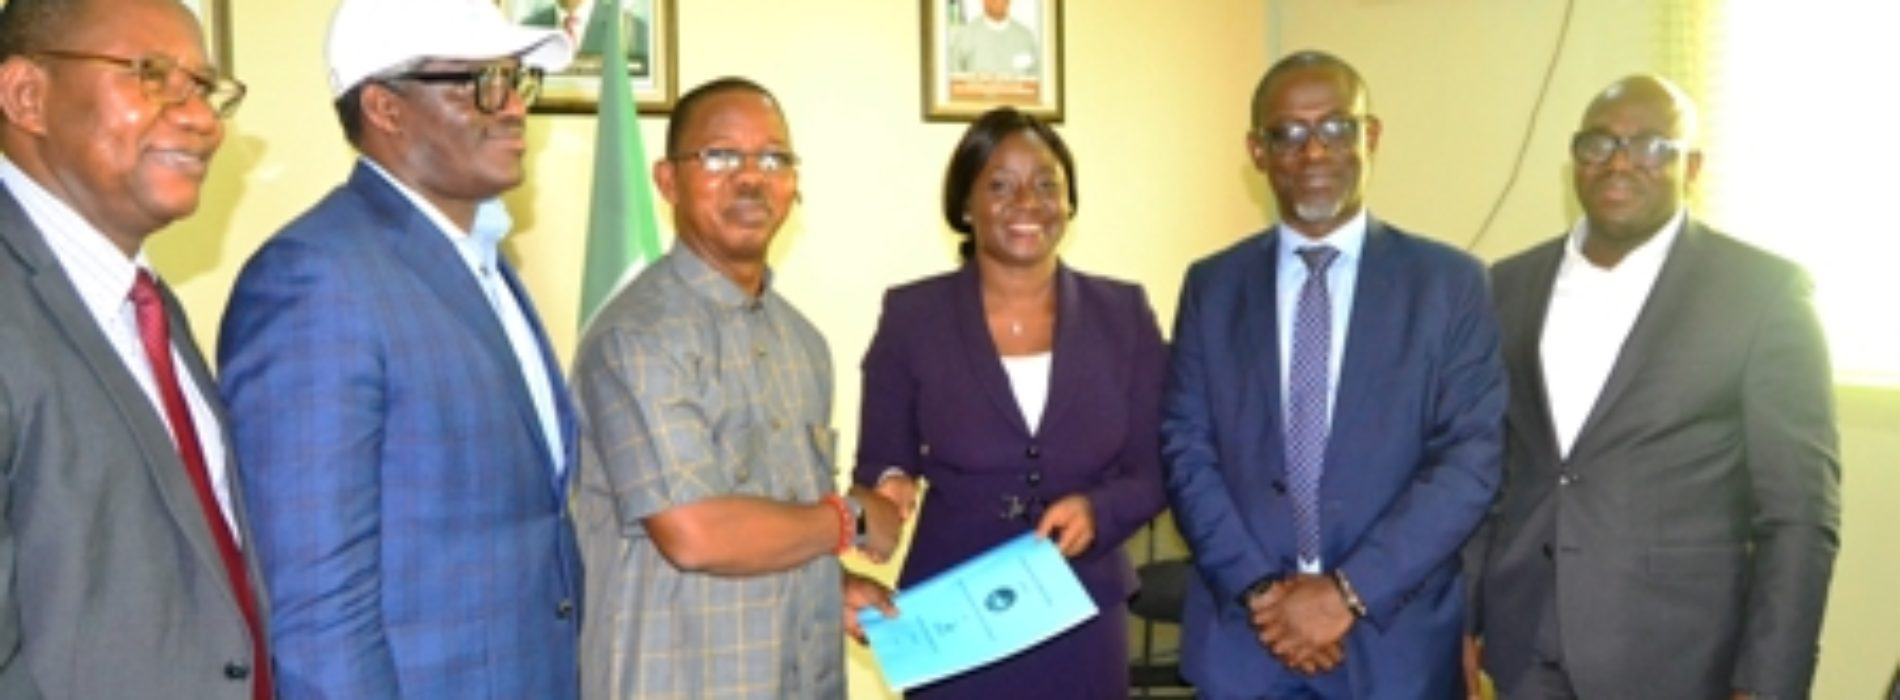 Delta, Sanofi, partner on diabetes, hypertension management